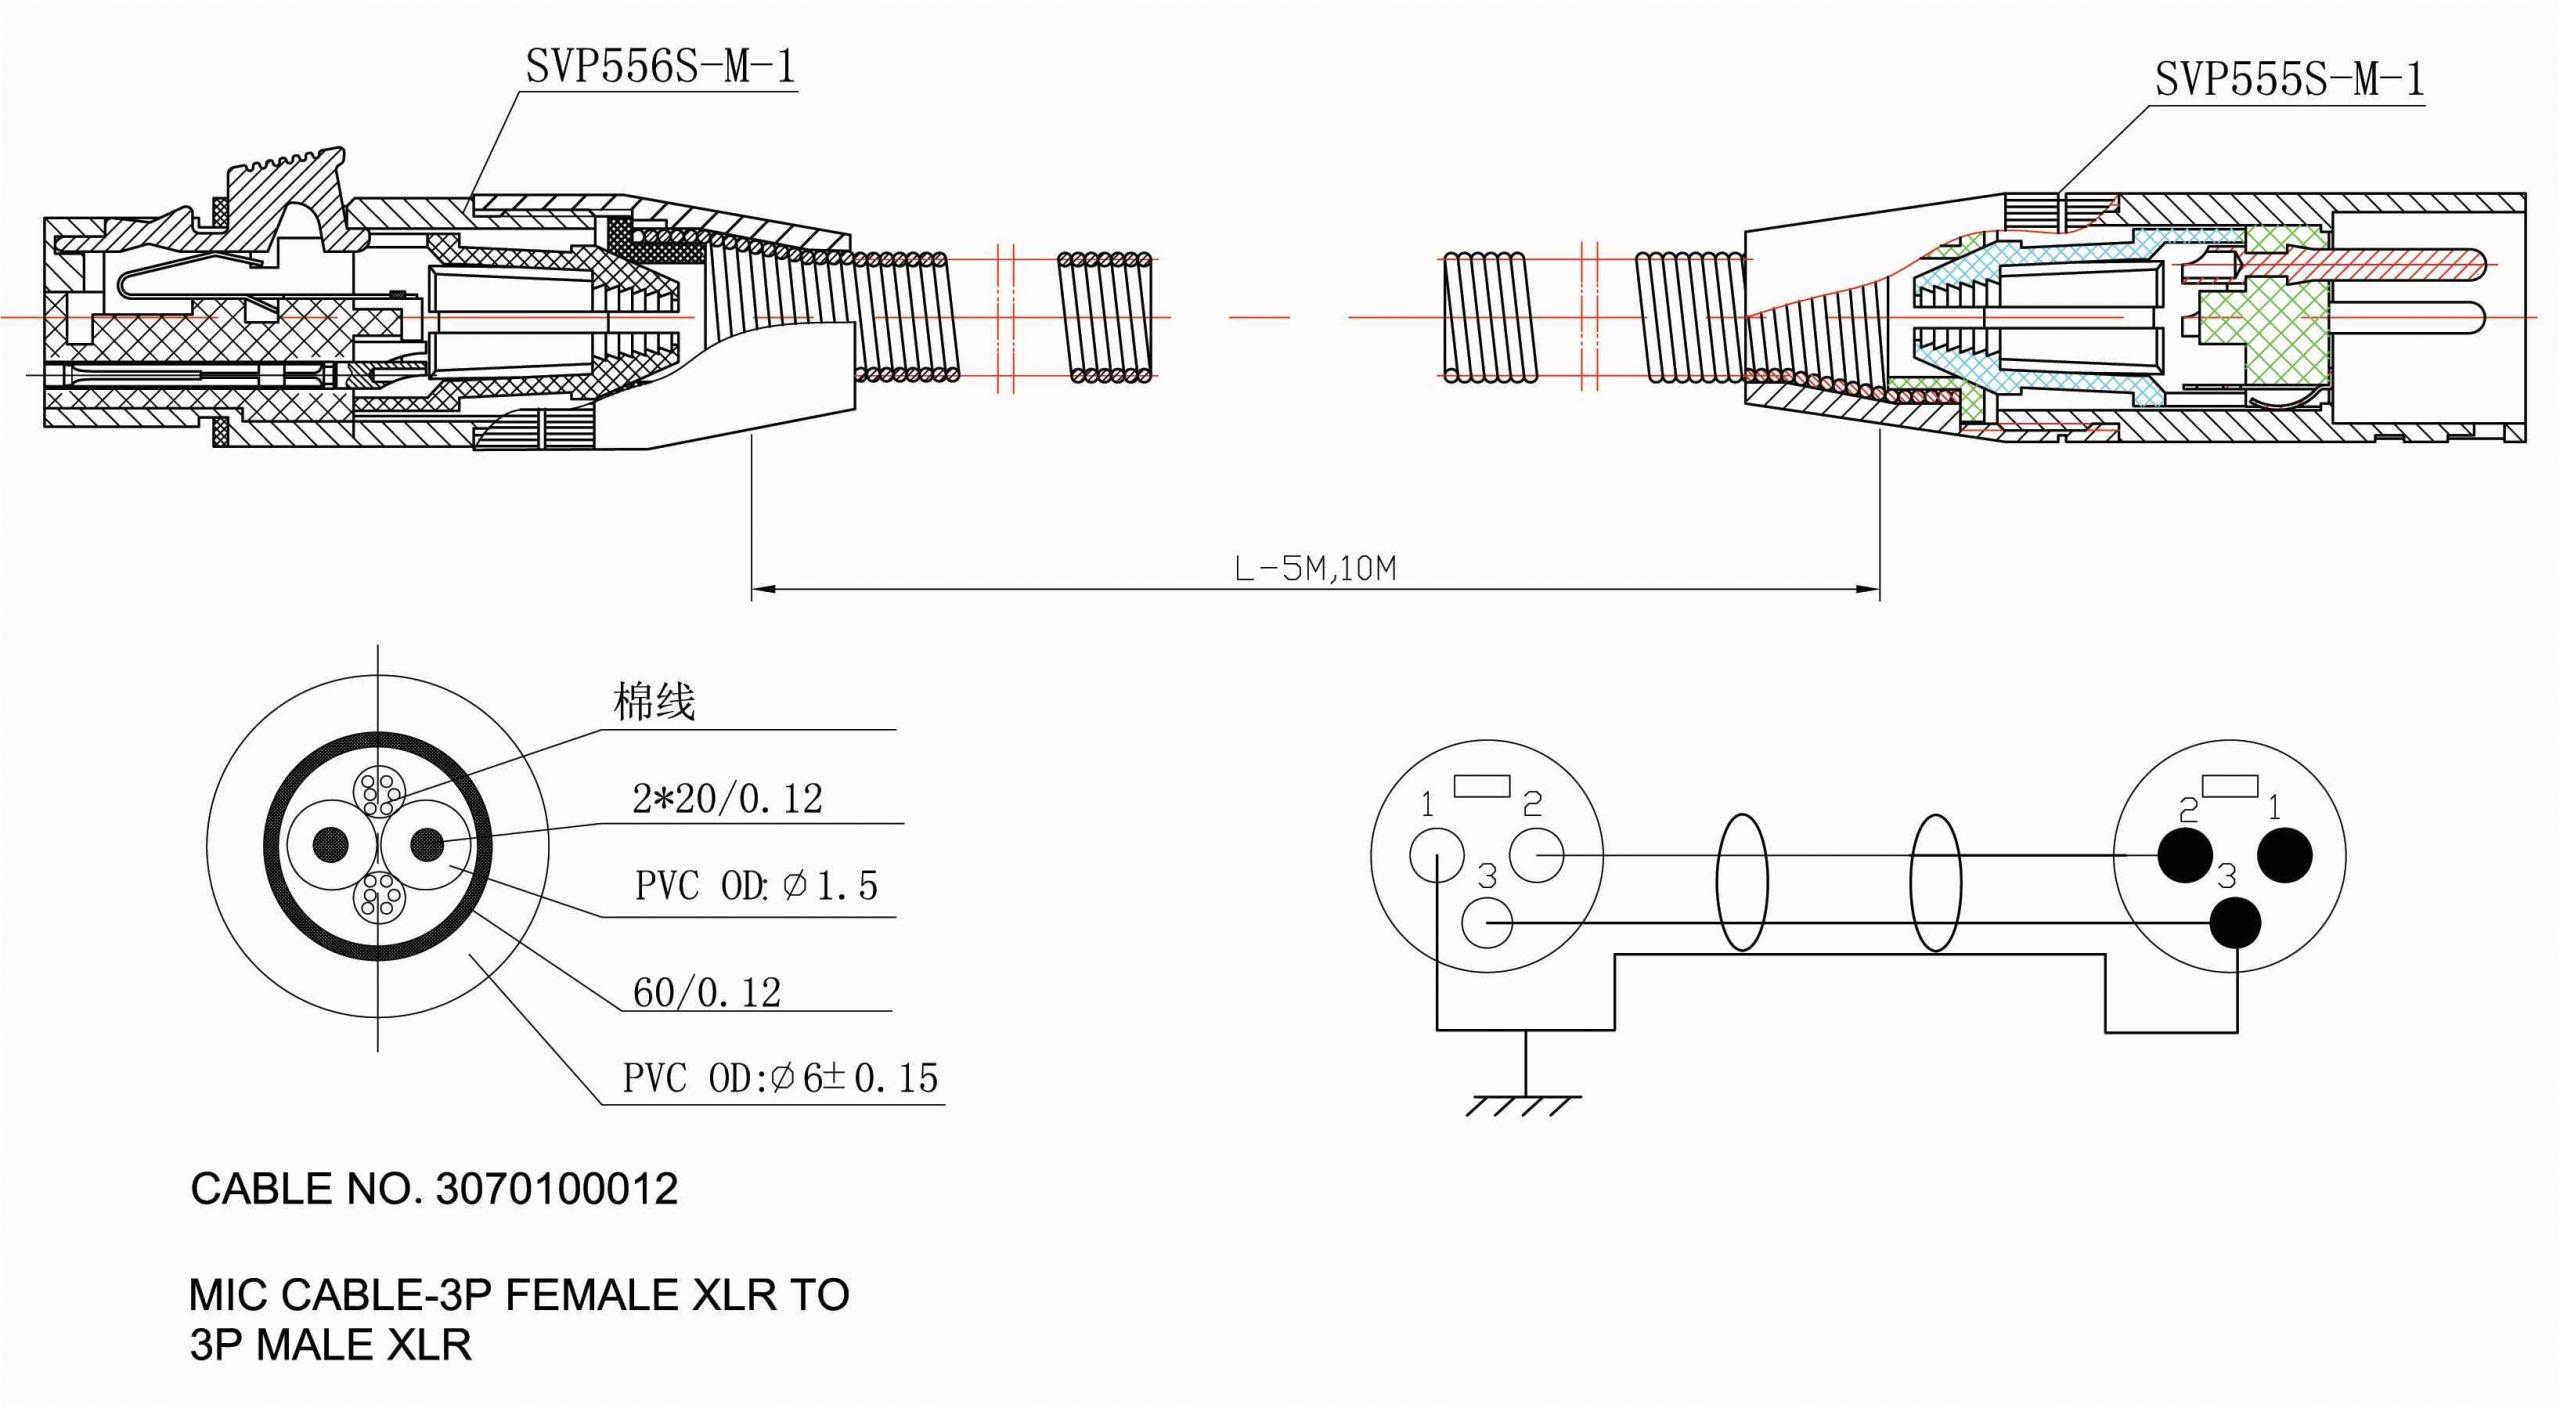 venture lighting wiring diagram fresh multiple gfci outlet wiring diagram wiring a lamp post with an of venture lighting wiring diagram within fresh wiring diagram for multiple gfci outlets png